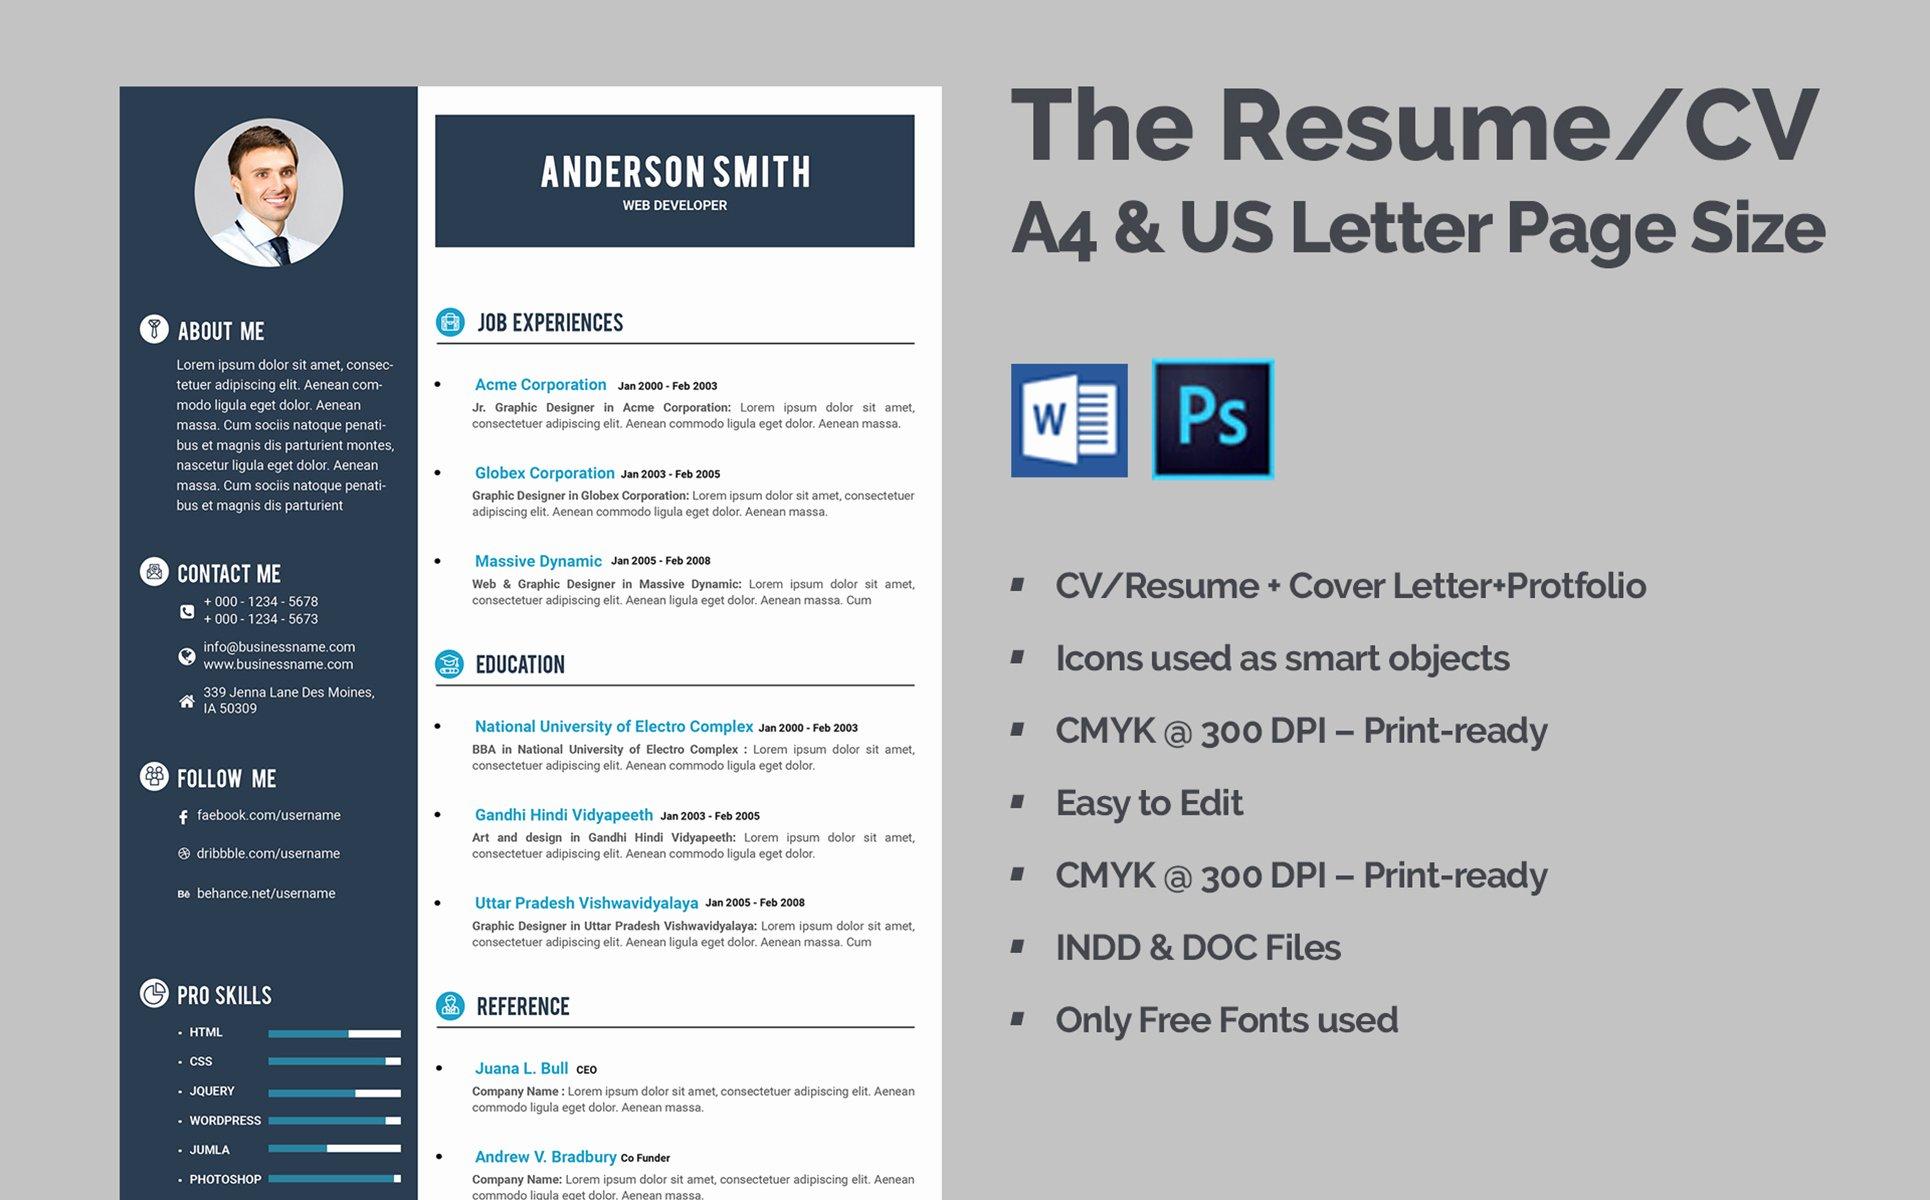 Web Developer Resume Template Awesome Web Developer Cv Resume Template